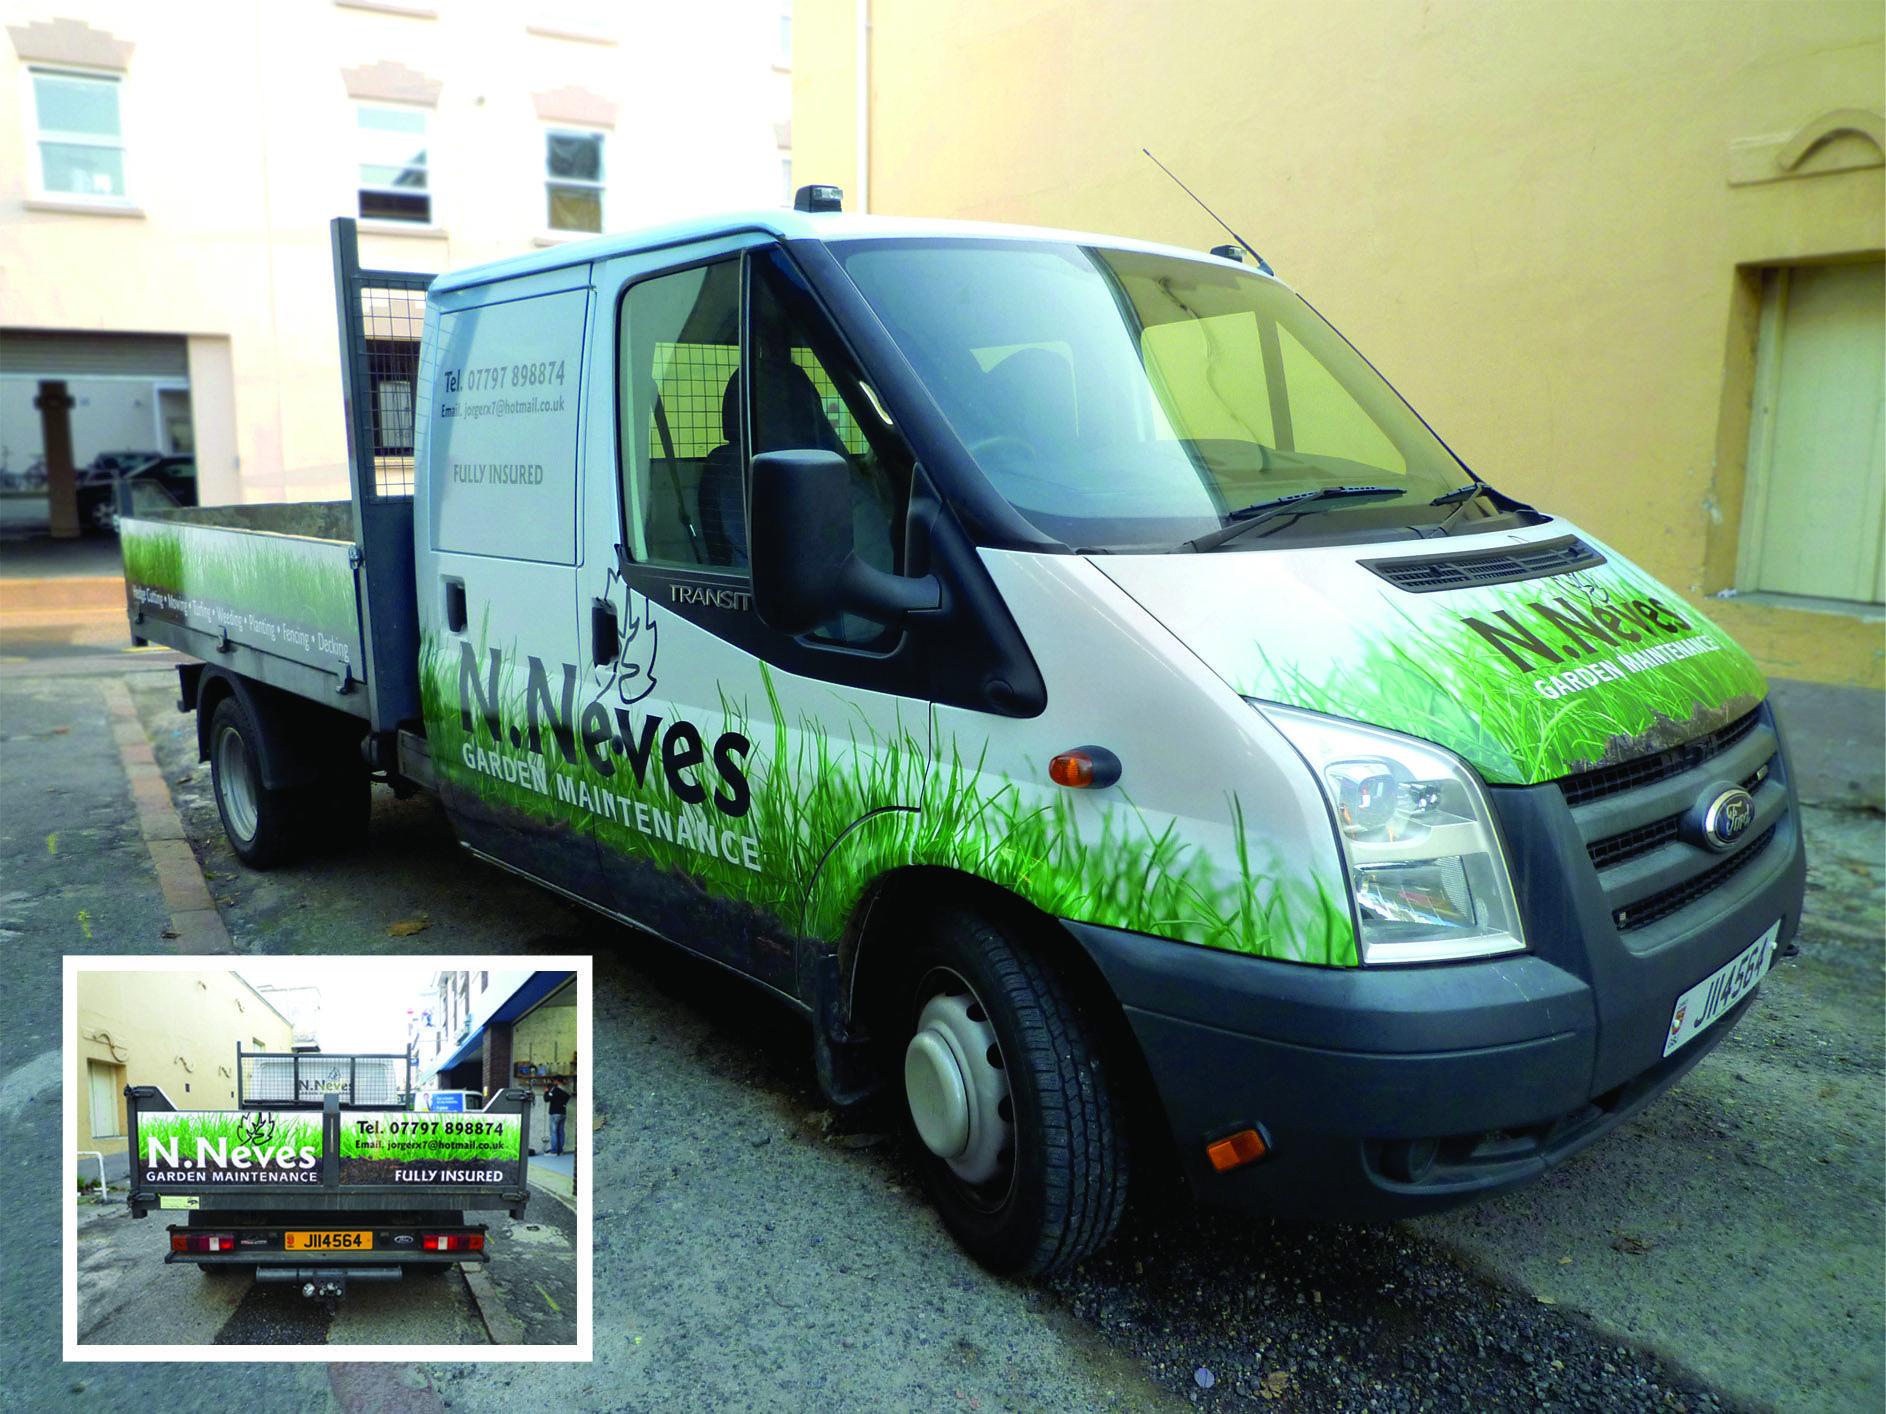 Ford Tipper Cab Van Wrap Van Wrap Car Wrap Van